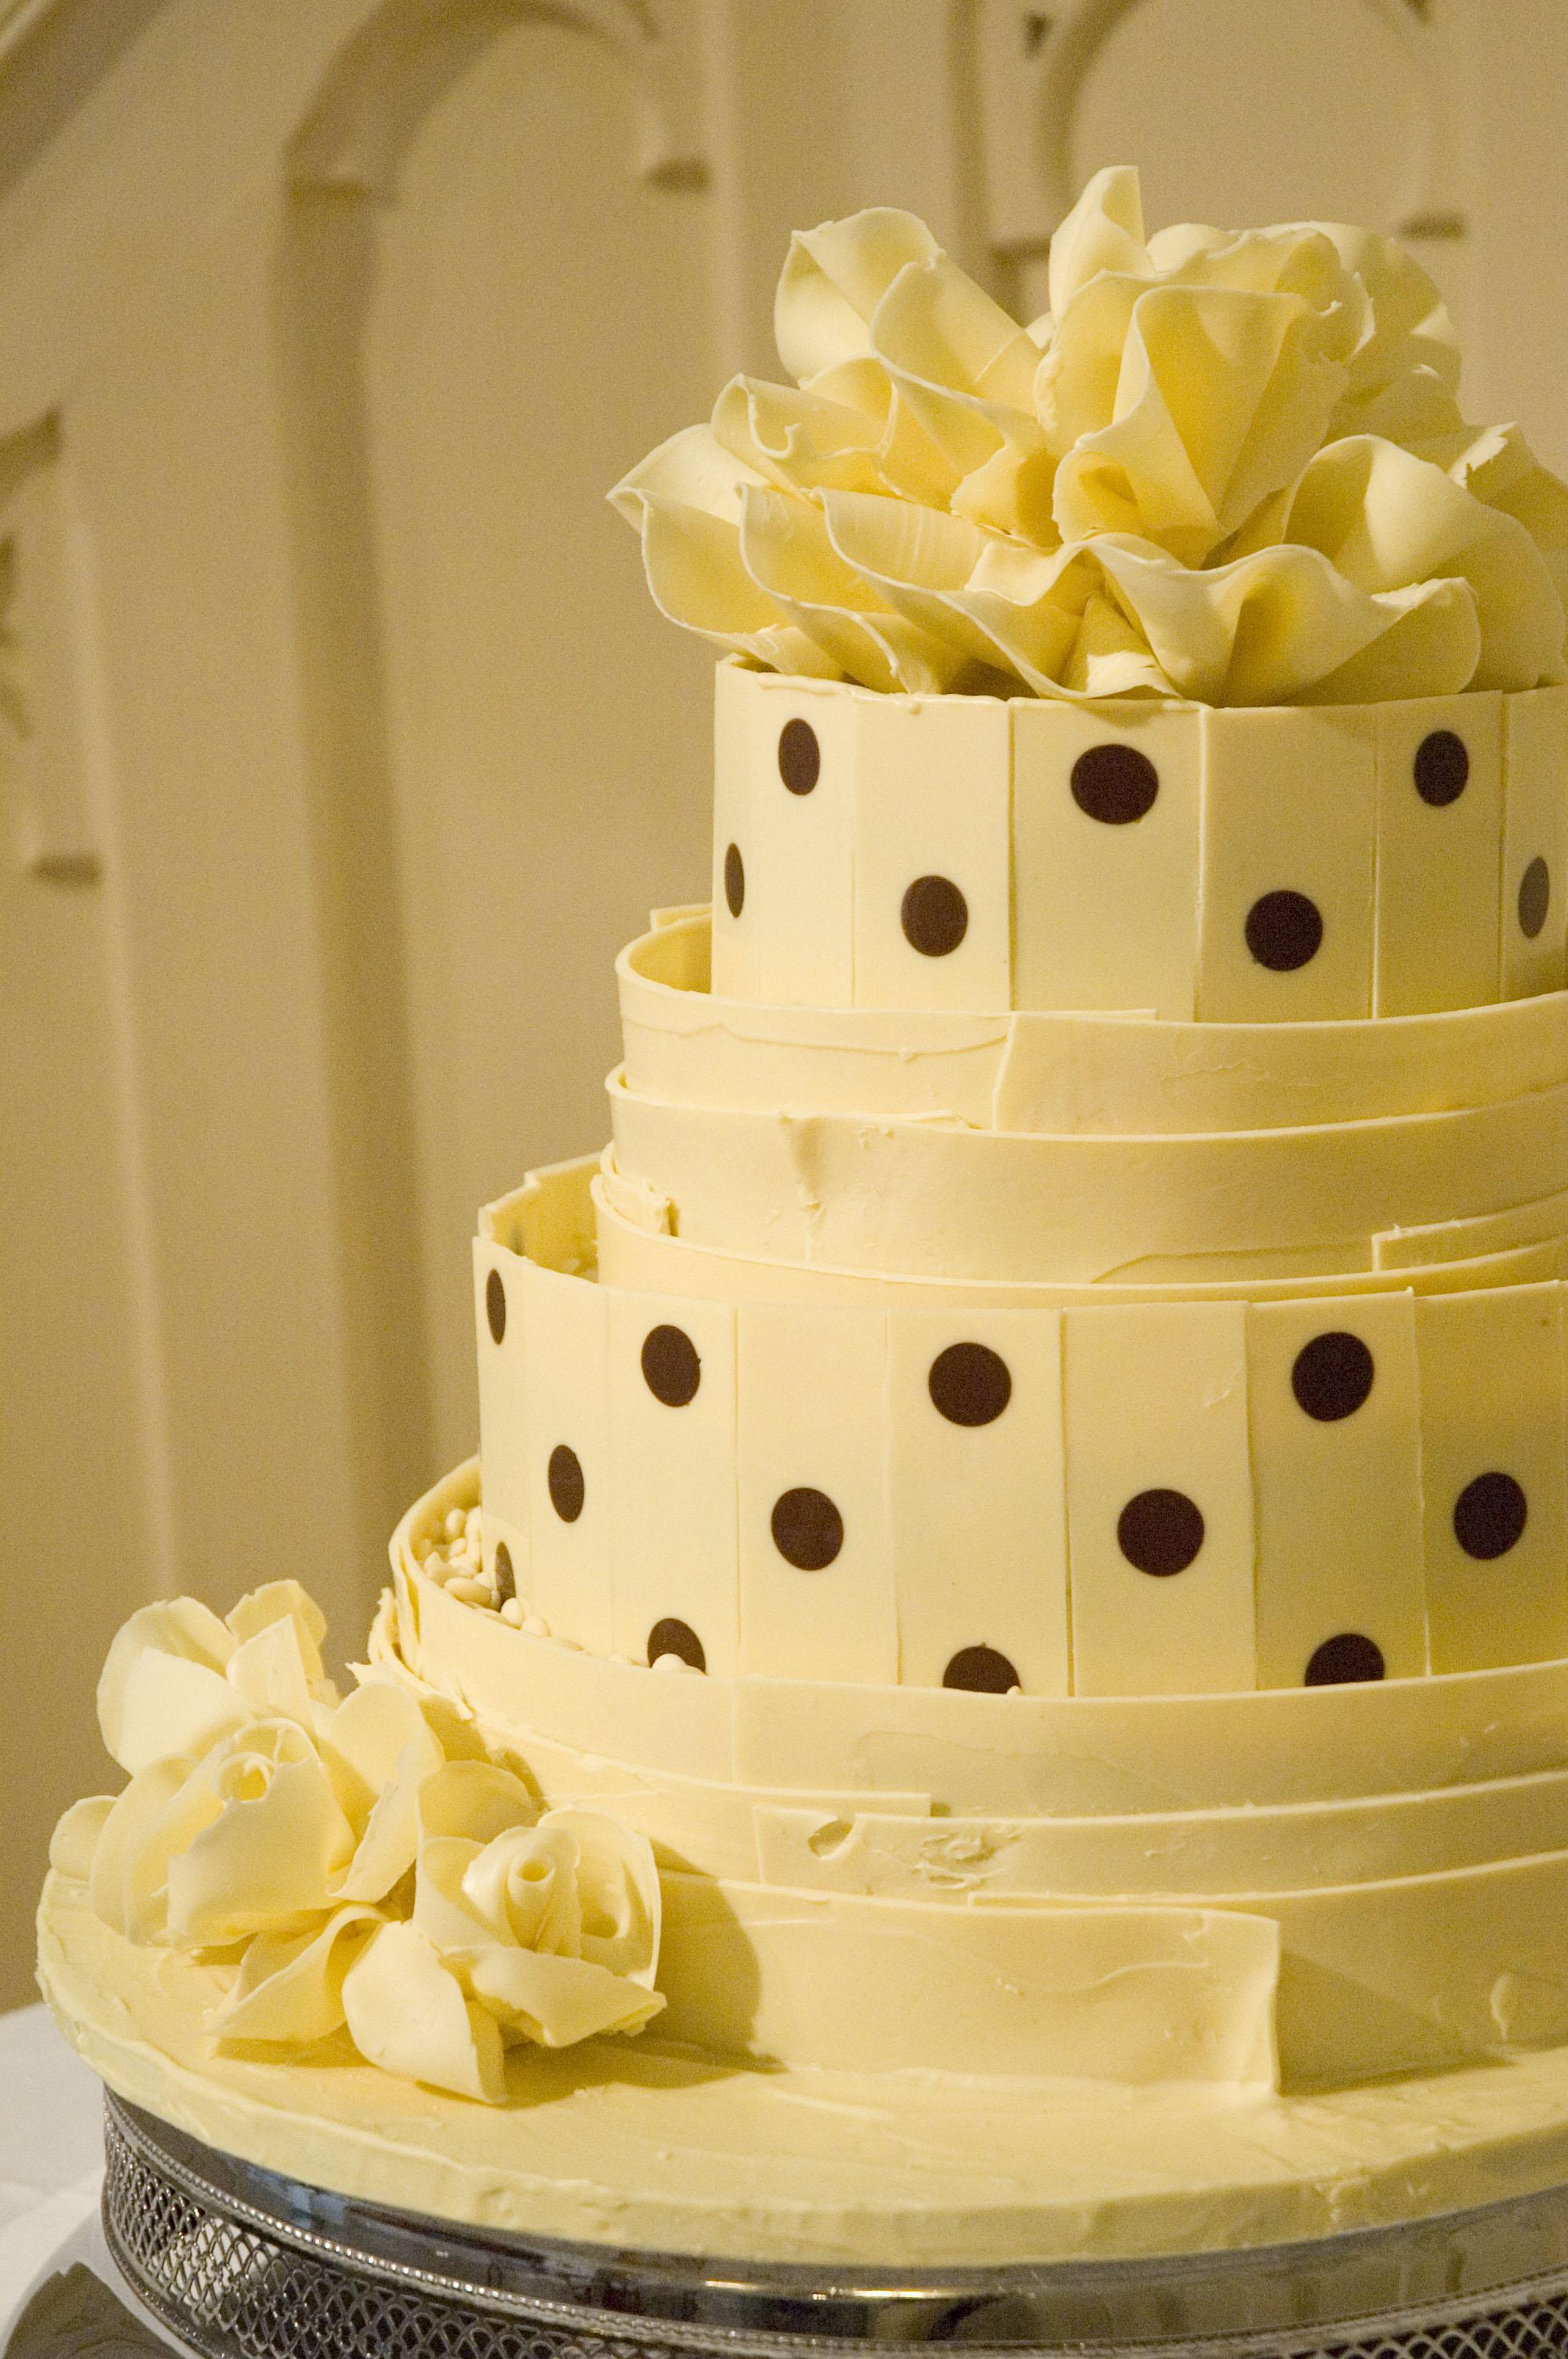 spotty white chololate wedding cake 03.jpg